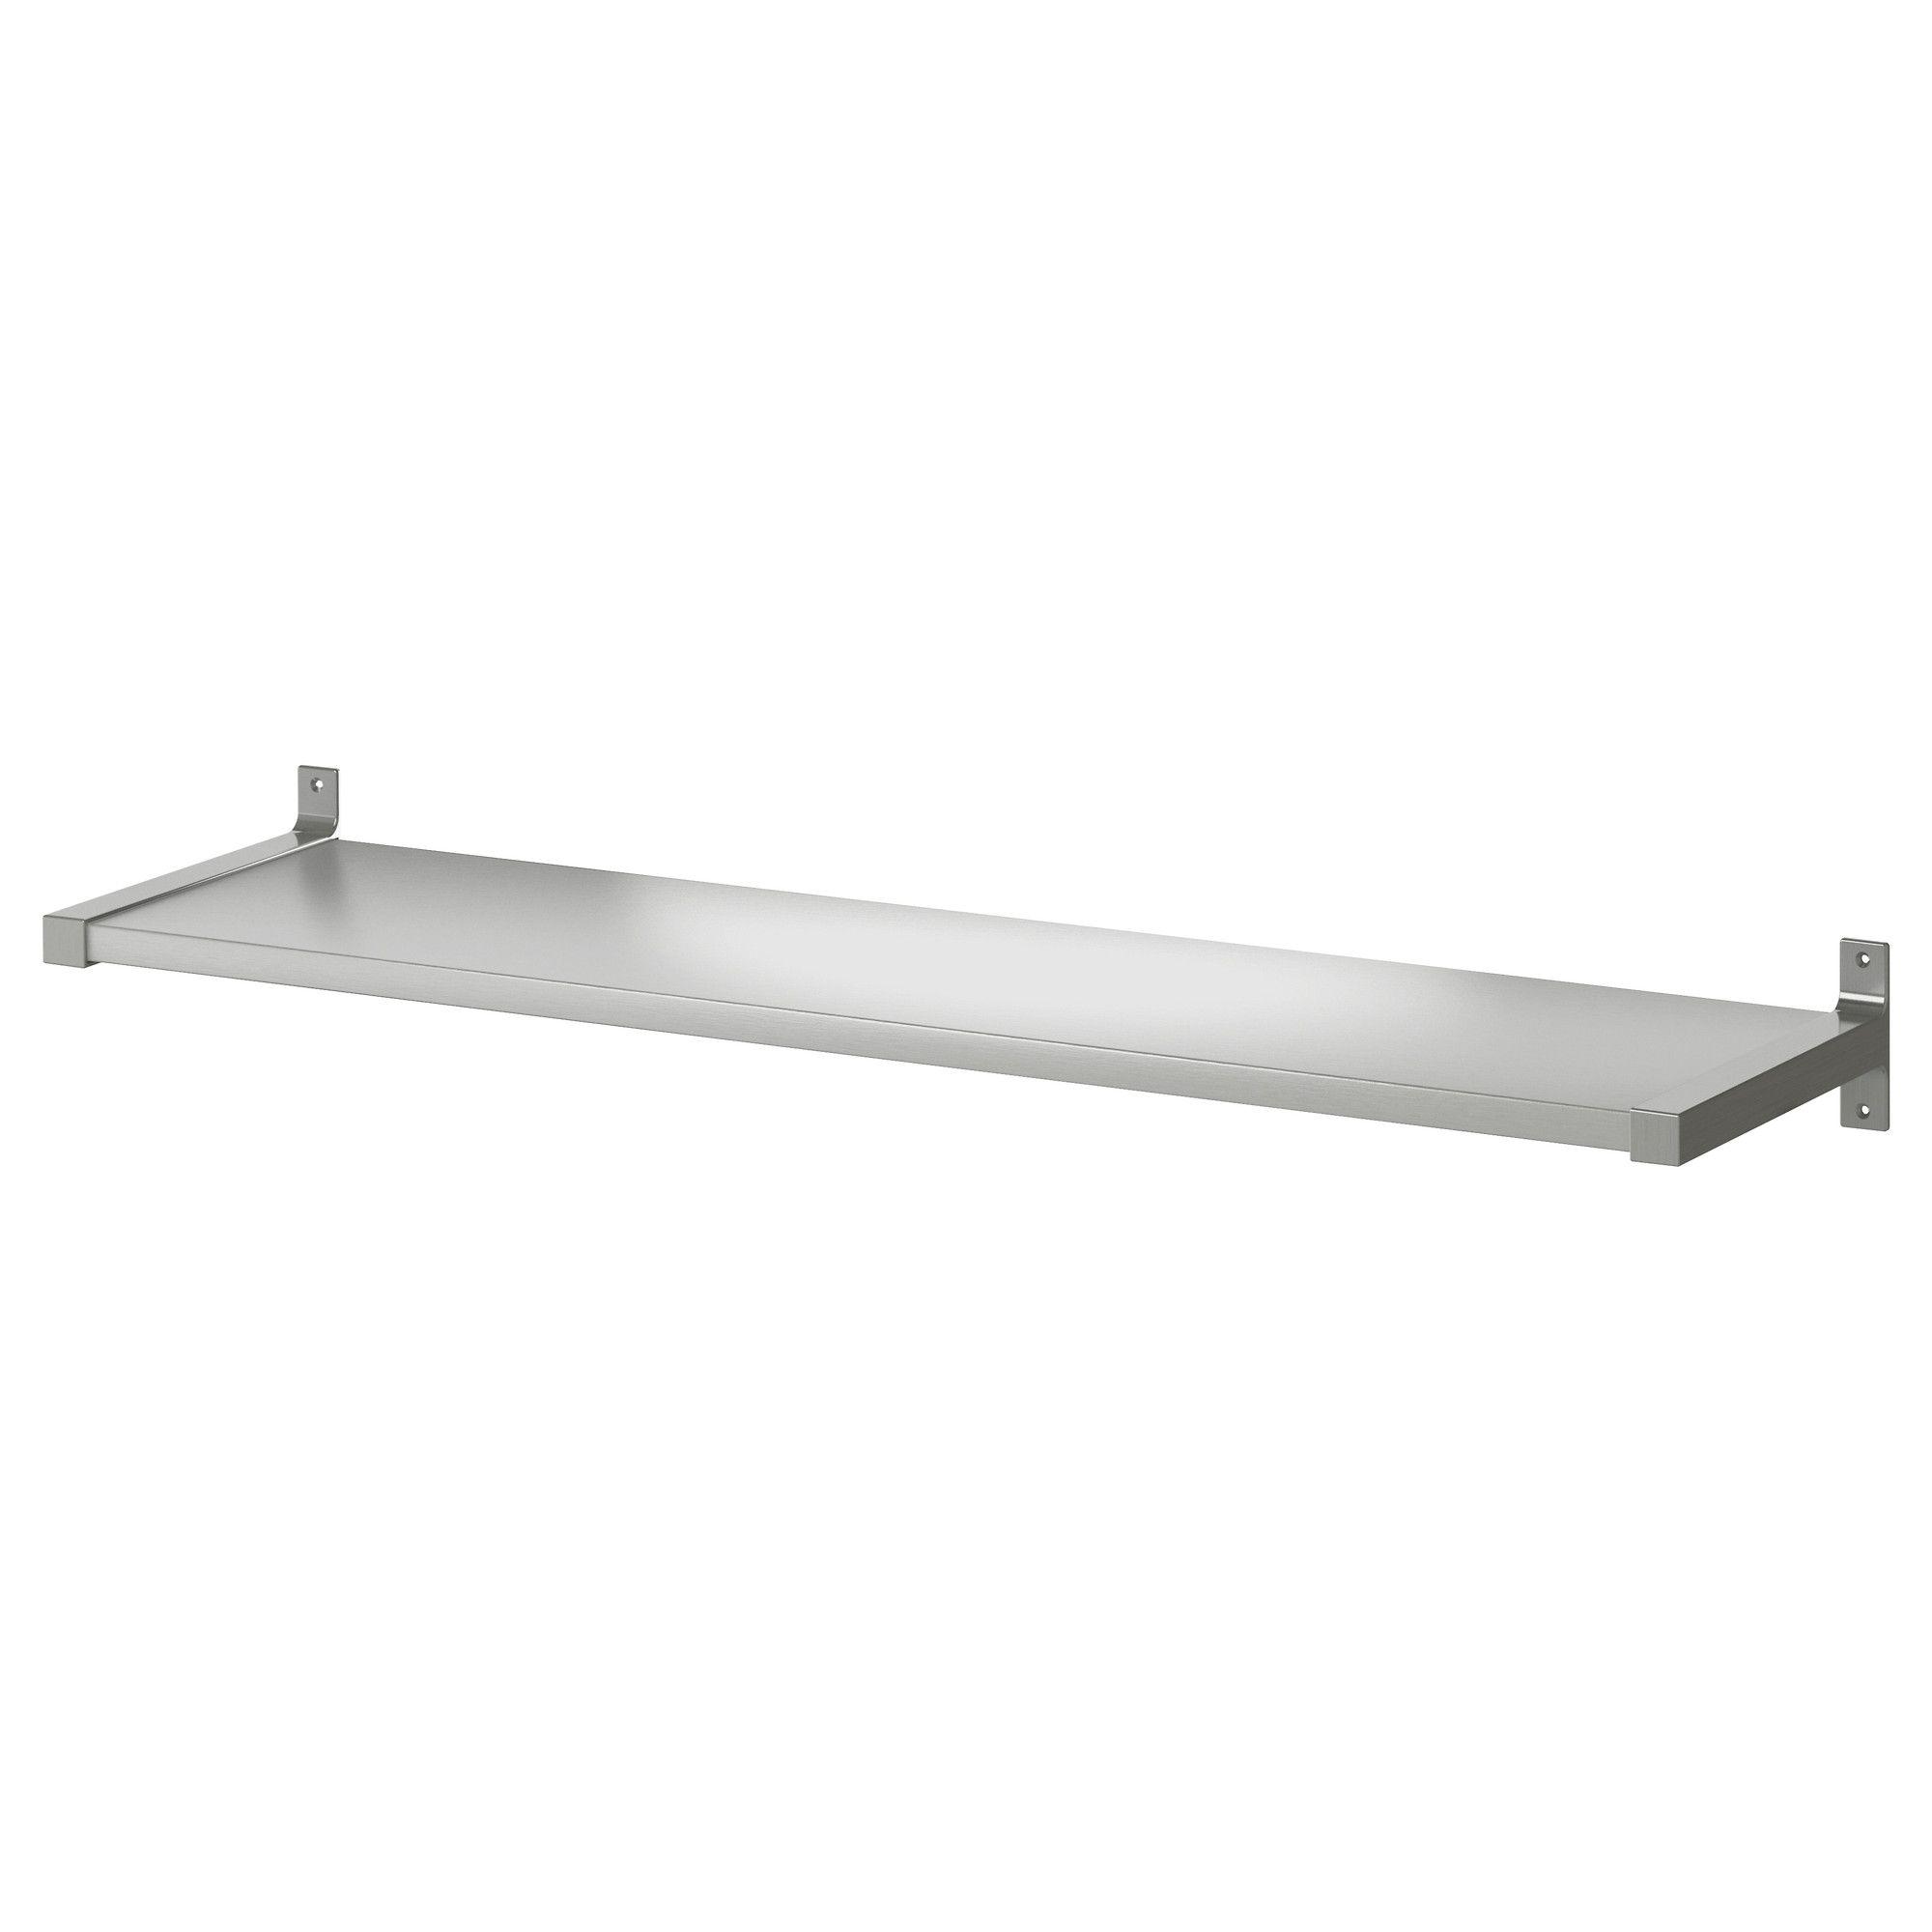 Ikea Us Furniture And Home Furnishings Wall Shelves Ikea Wall